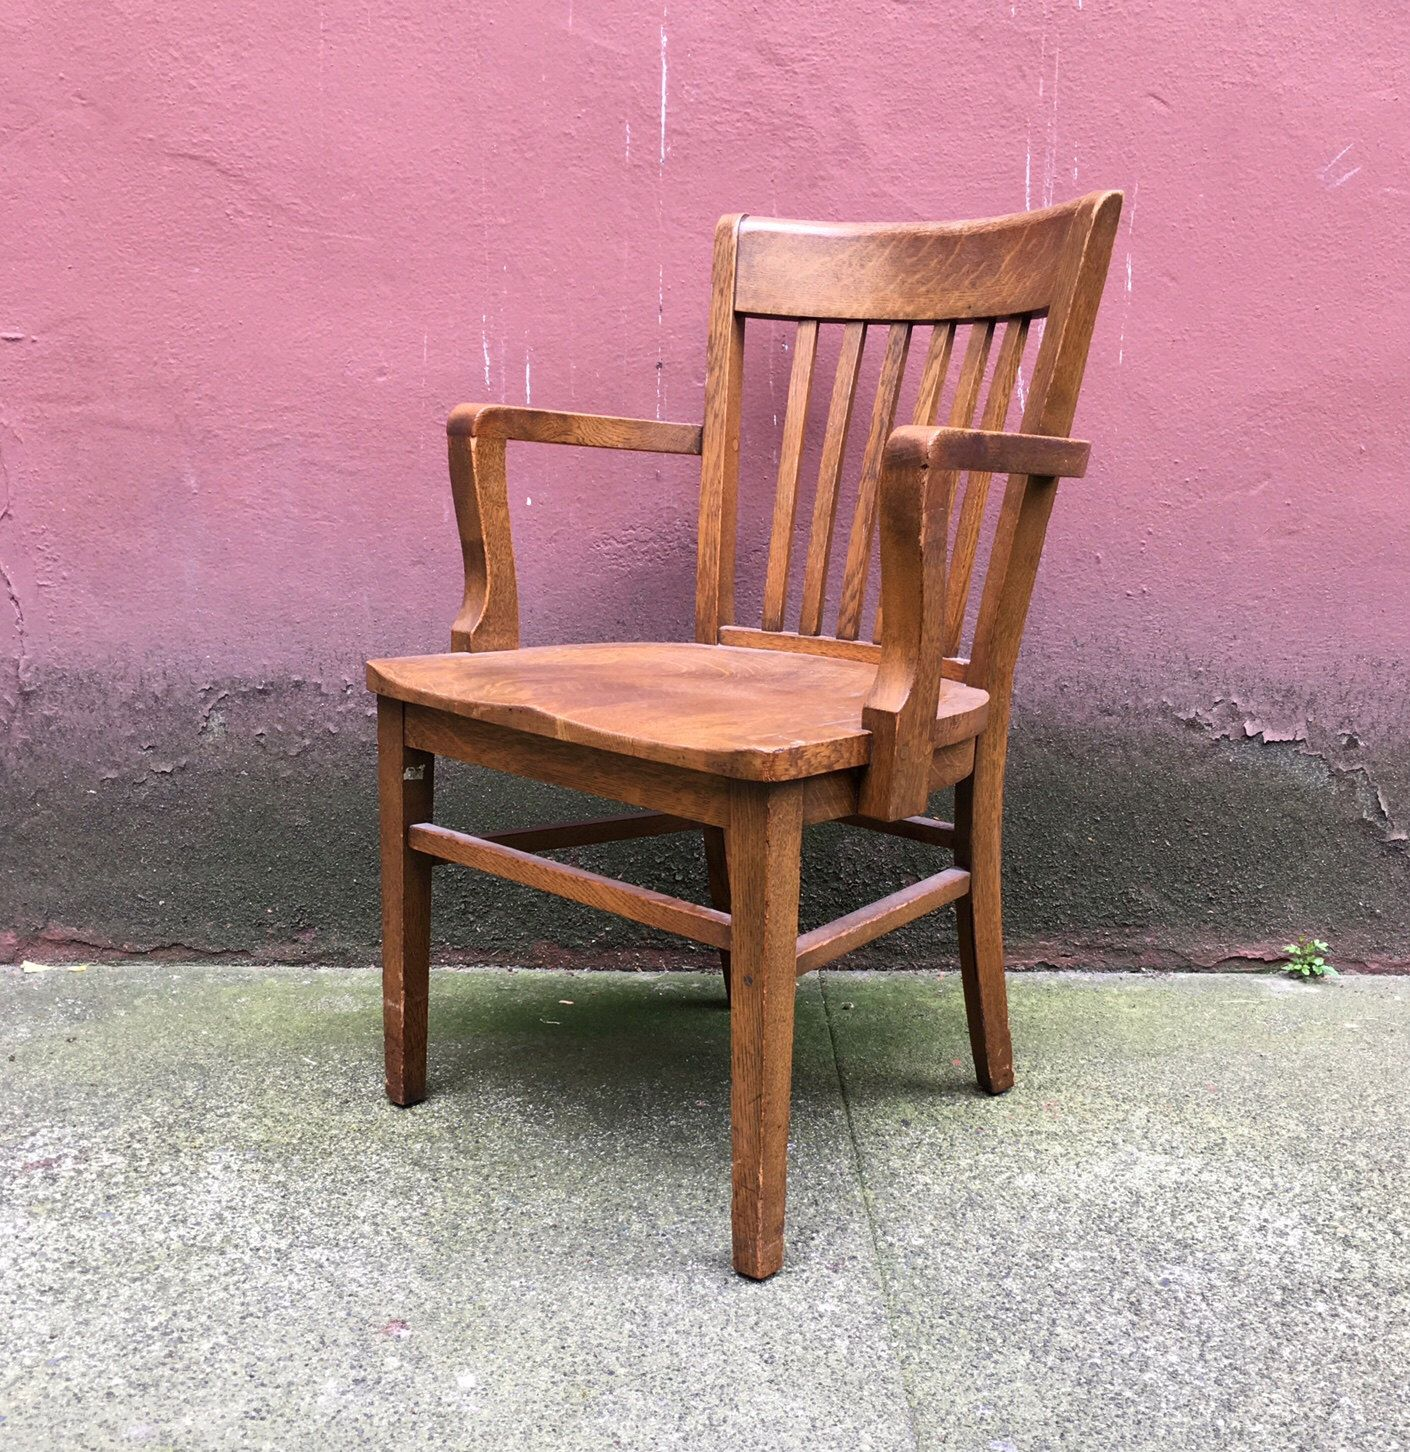 vintage oak bankeru0027s chair by Marble u0026 Shattuck Chair Co. retro office furniture. antique arm chair. by ReRunRoom on Etsy ... & vintage oak bankeru0027s chair by Marble u0026 Shattuck Chair Co. retro ...